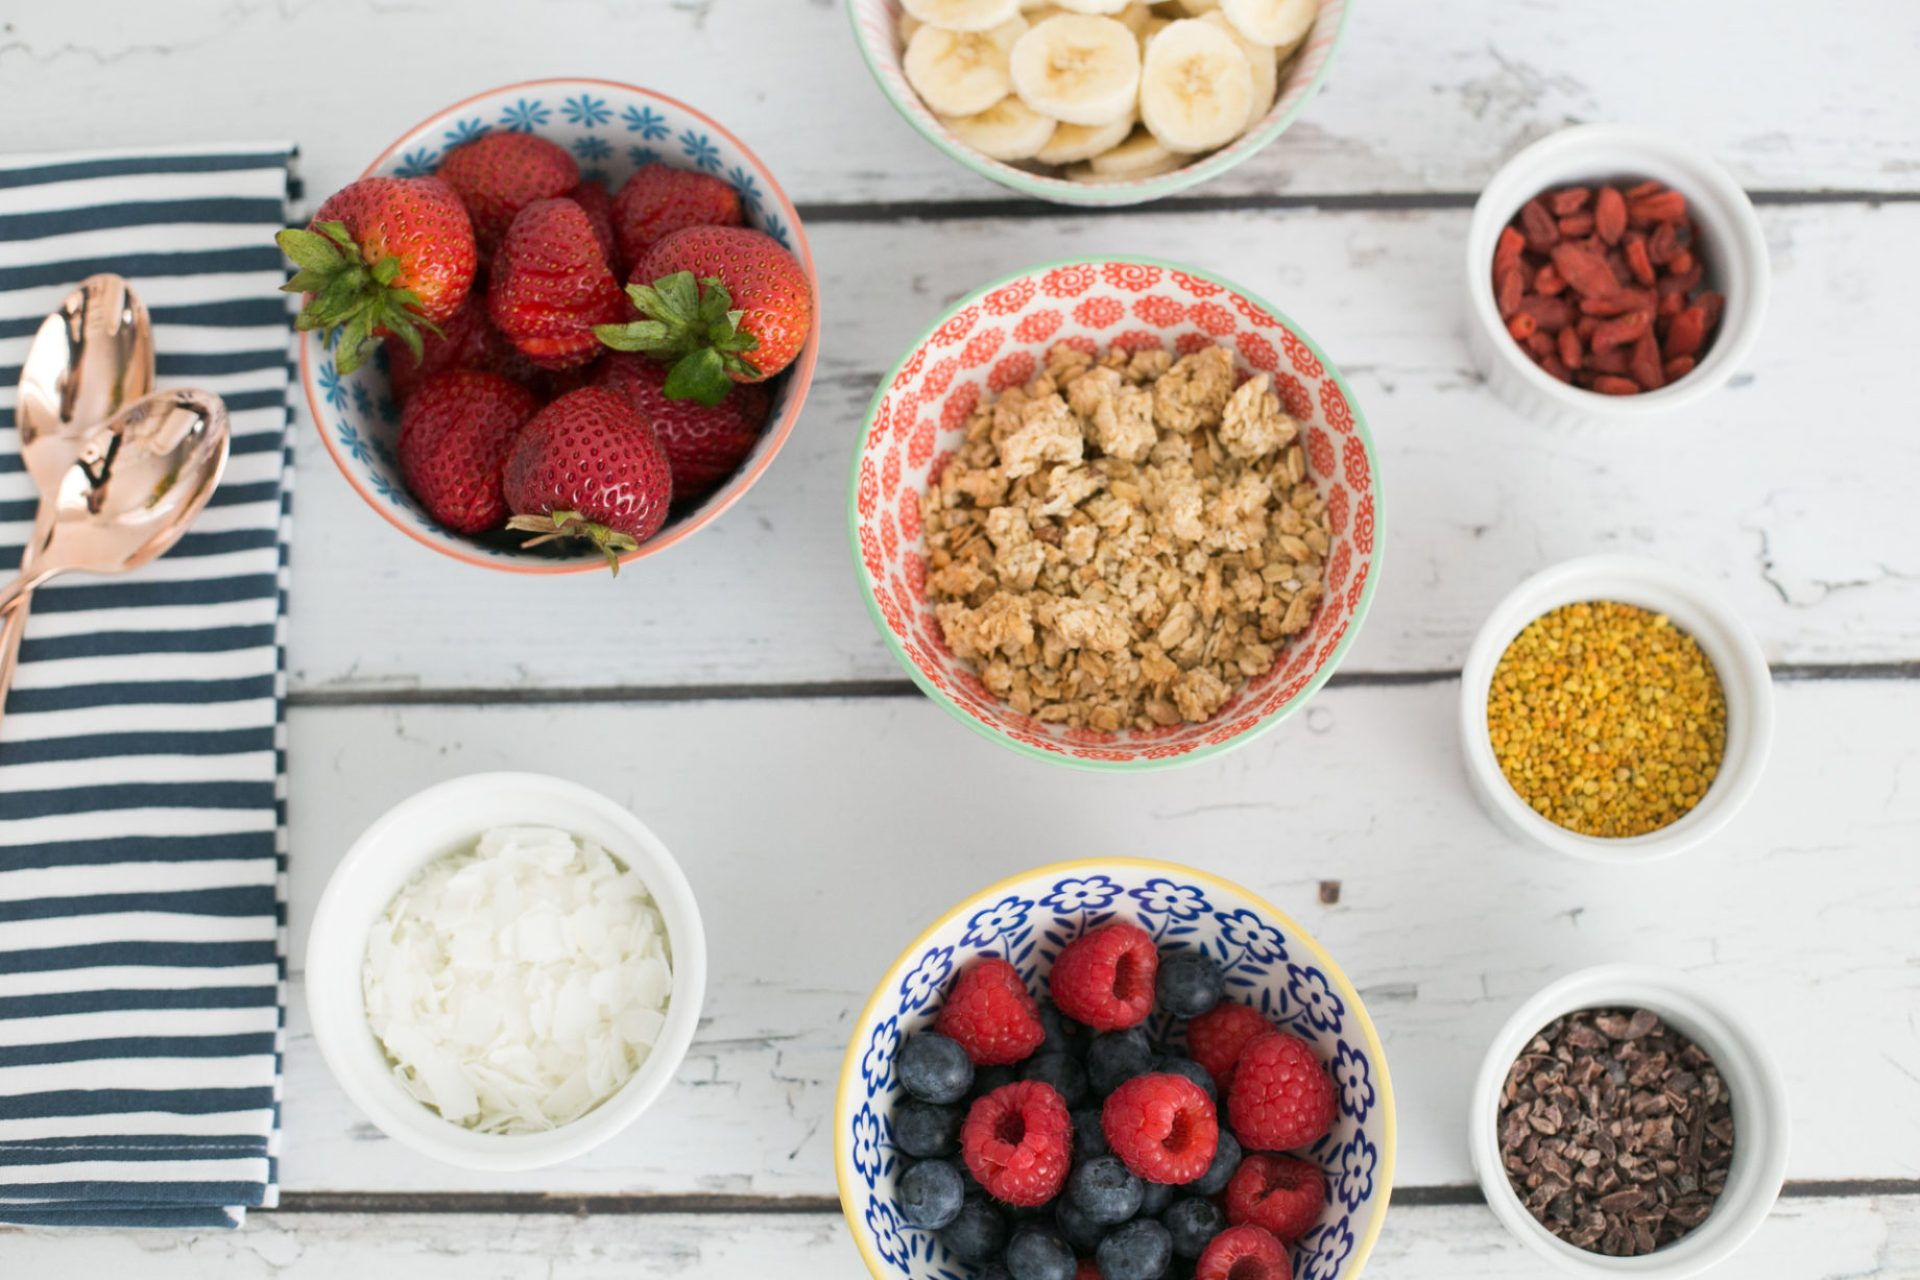 DIY acai bowl toppings